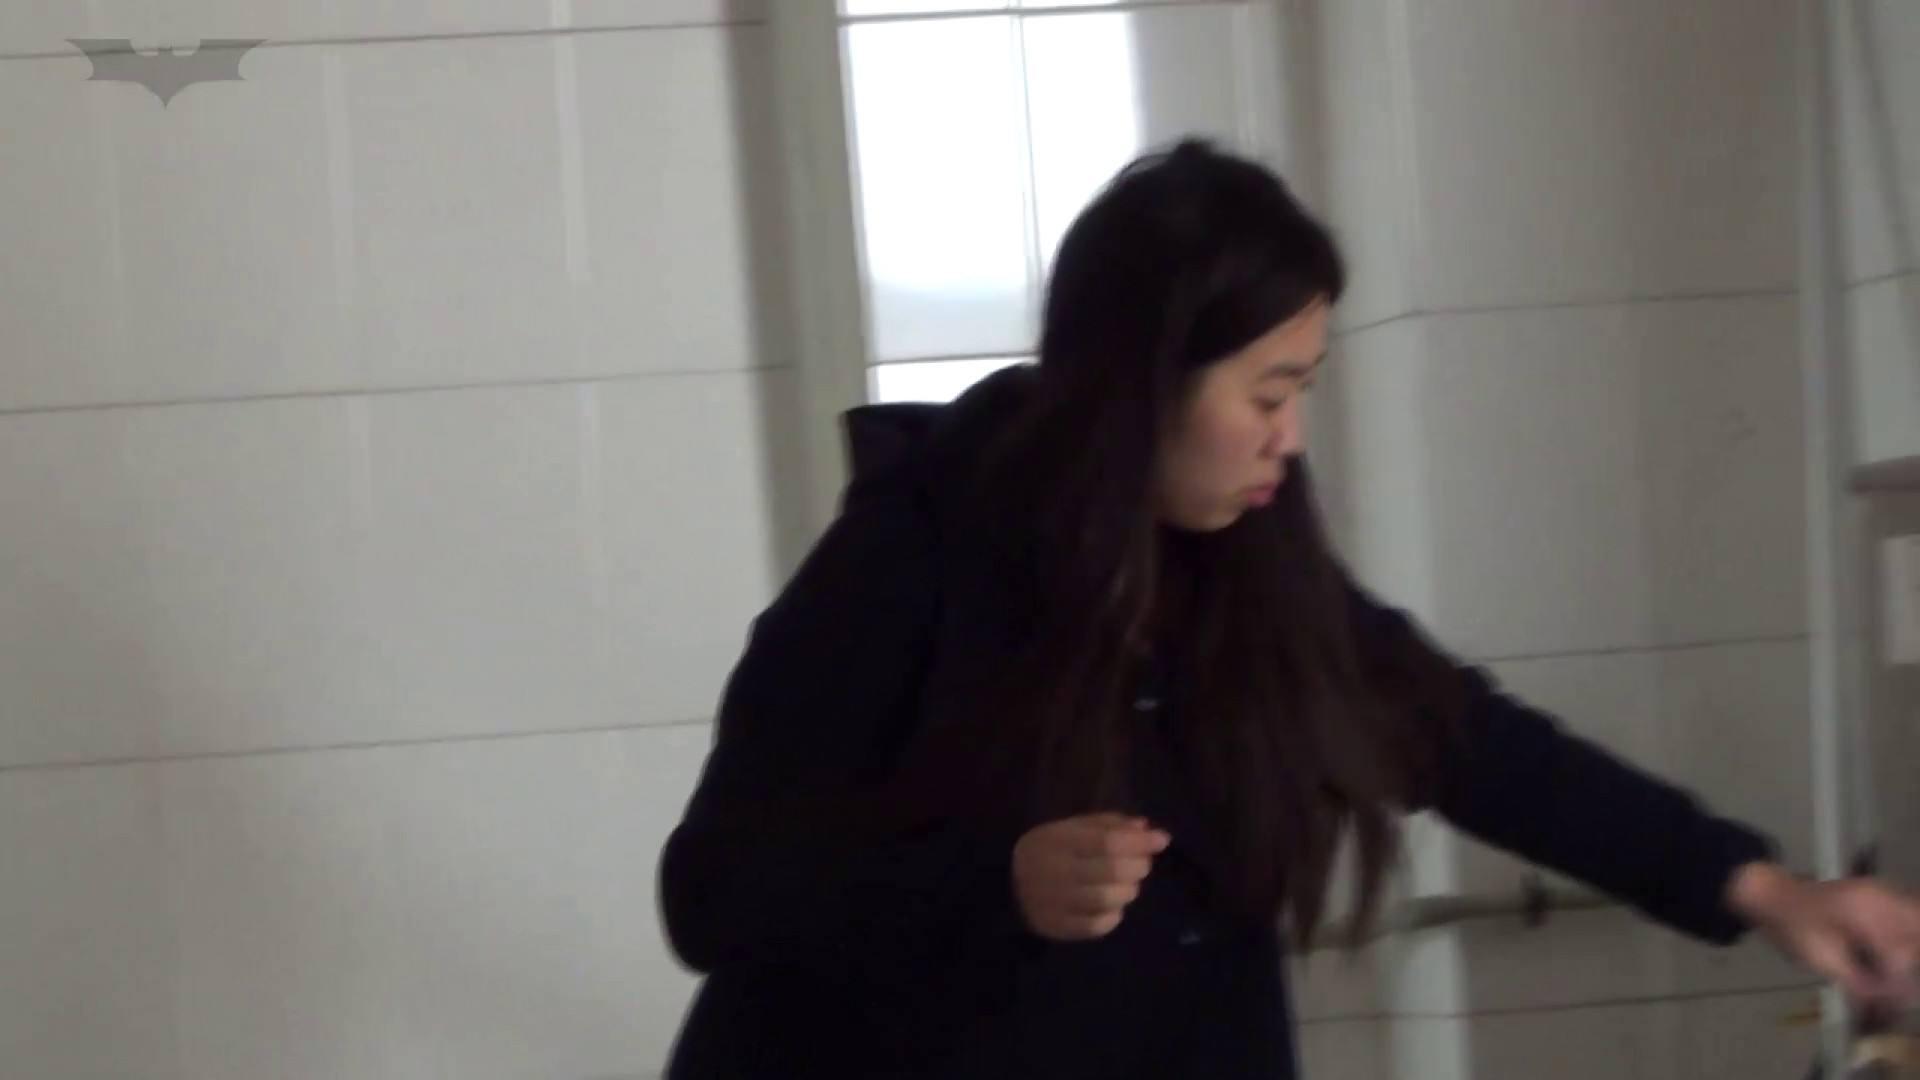 JD盗撮 美女の洗面所の秘密 Vol.36 高評価 おまんこ無修正動画無料 111枚 108